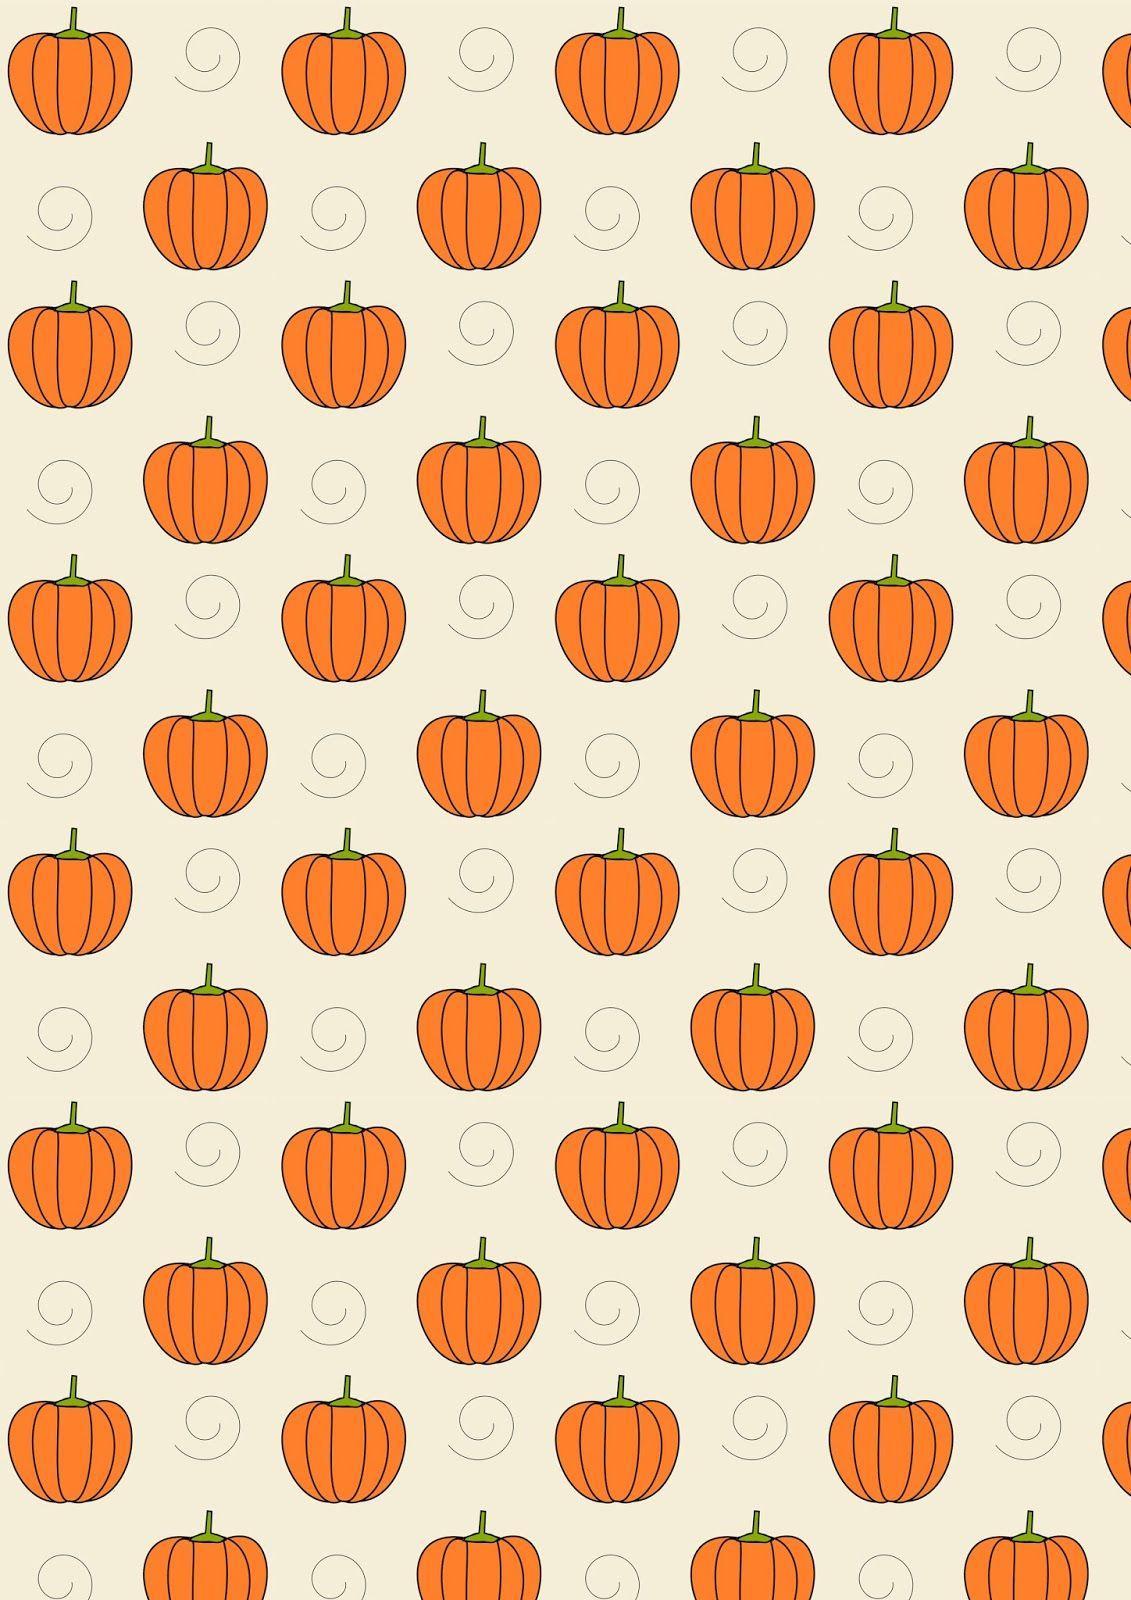 Cute Cartoon Pumpkin Wallpapers Top Free Cute Cartoon Pumpkin Backgrounds Wallpaperaccess